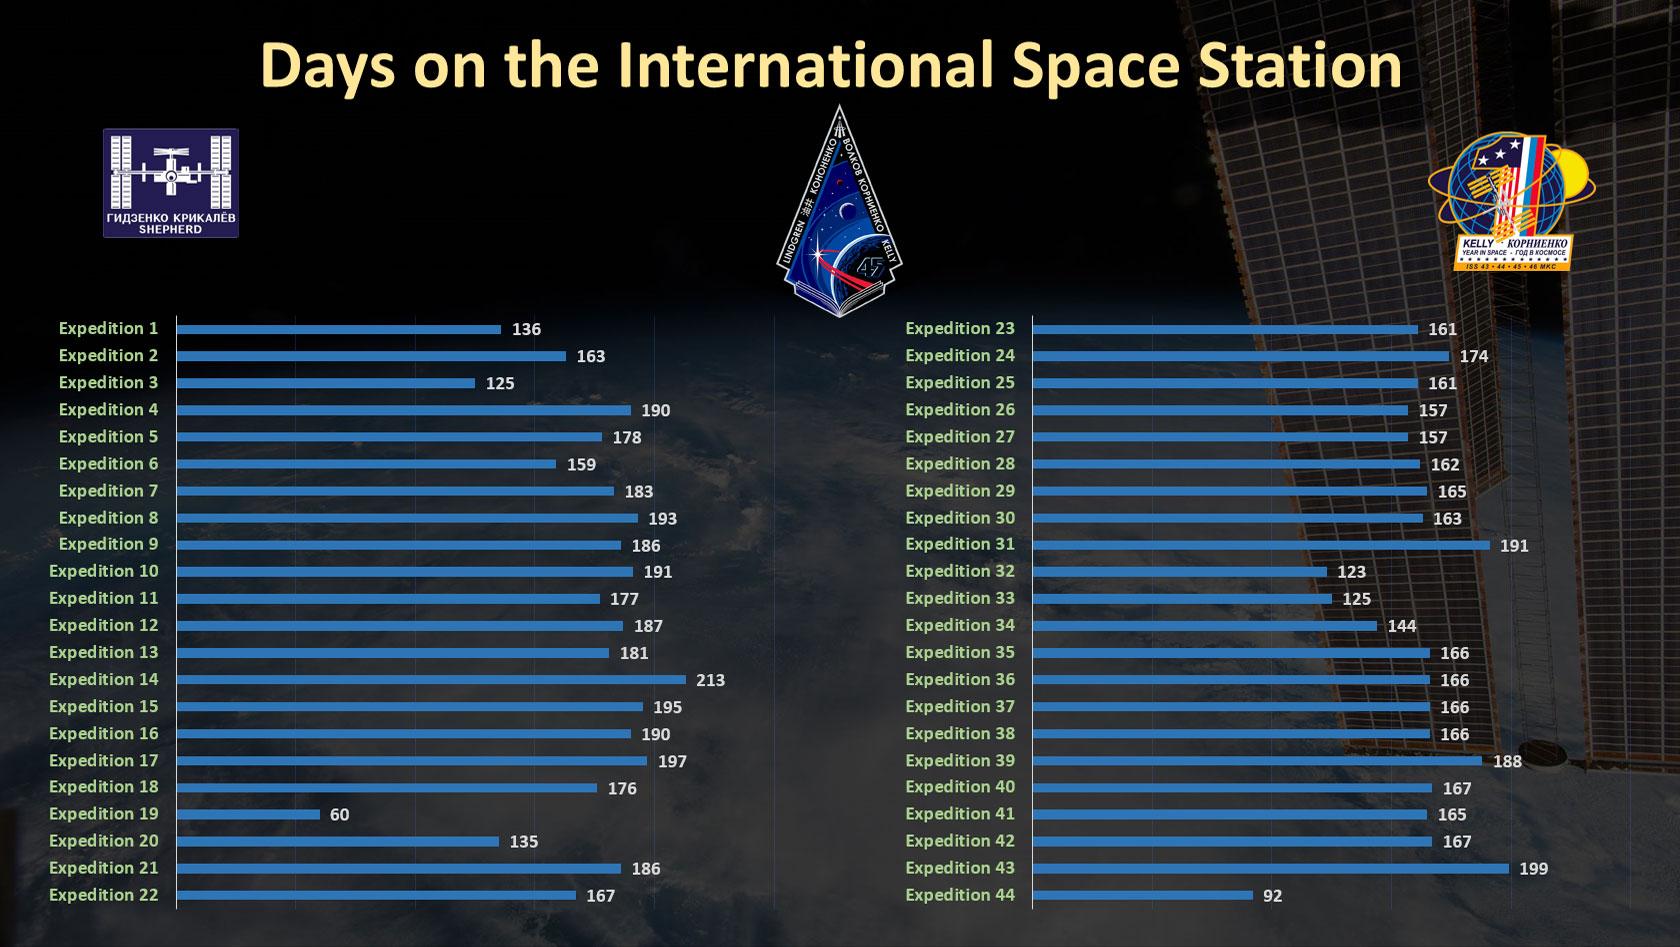 nasa international space station information - photo #32